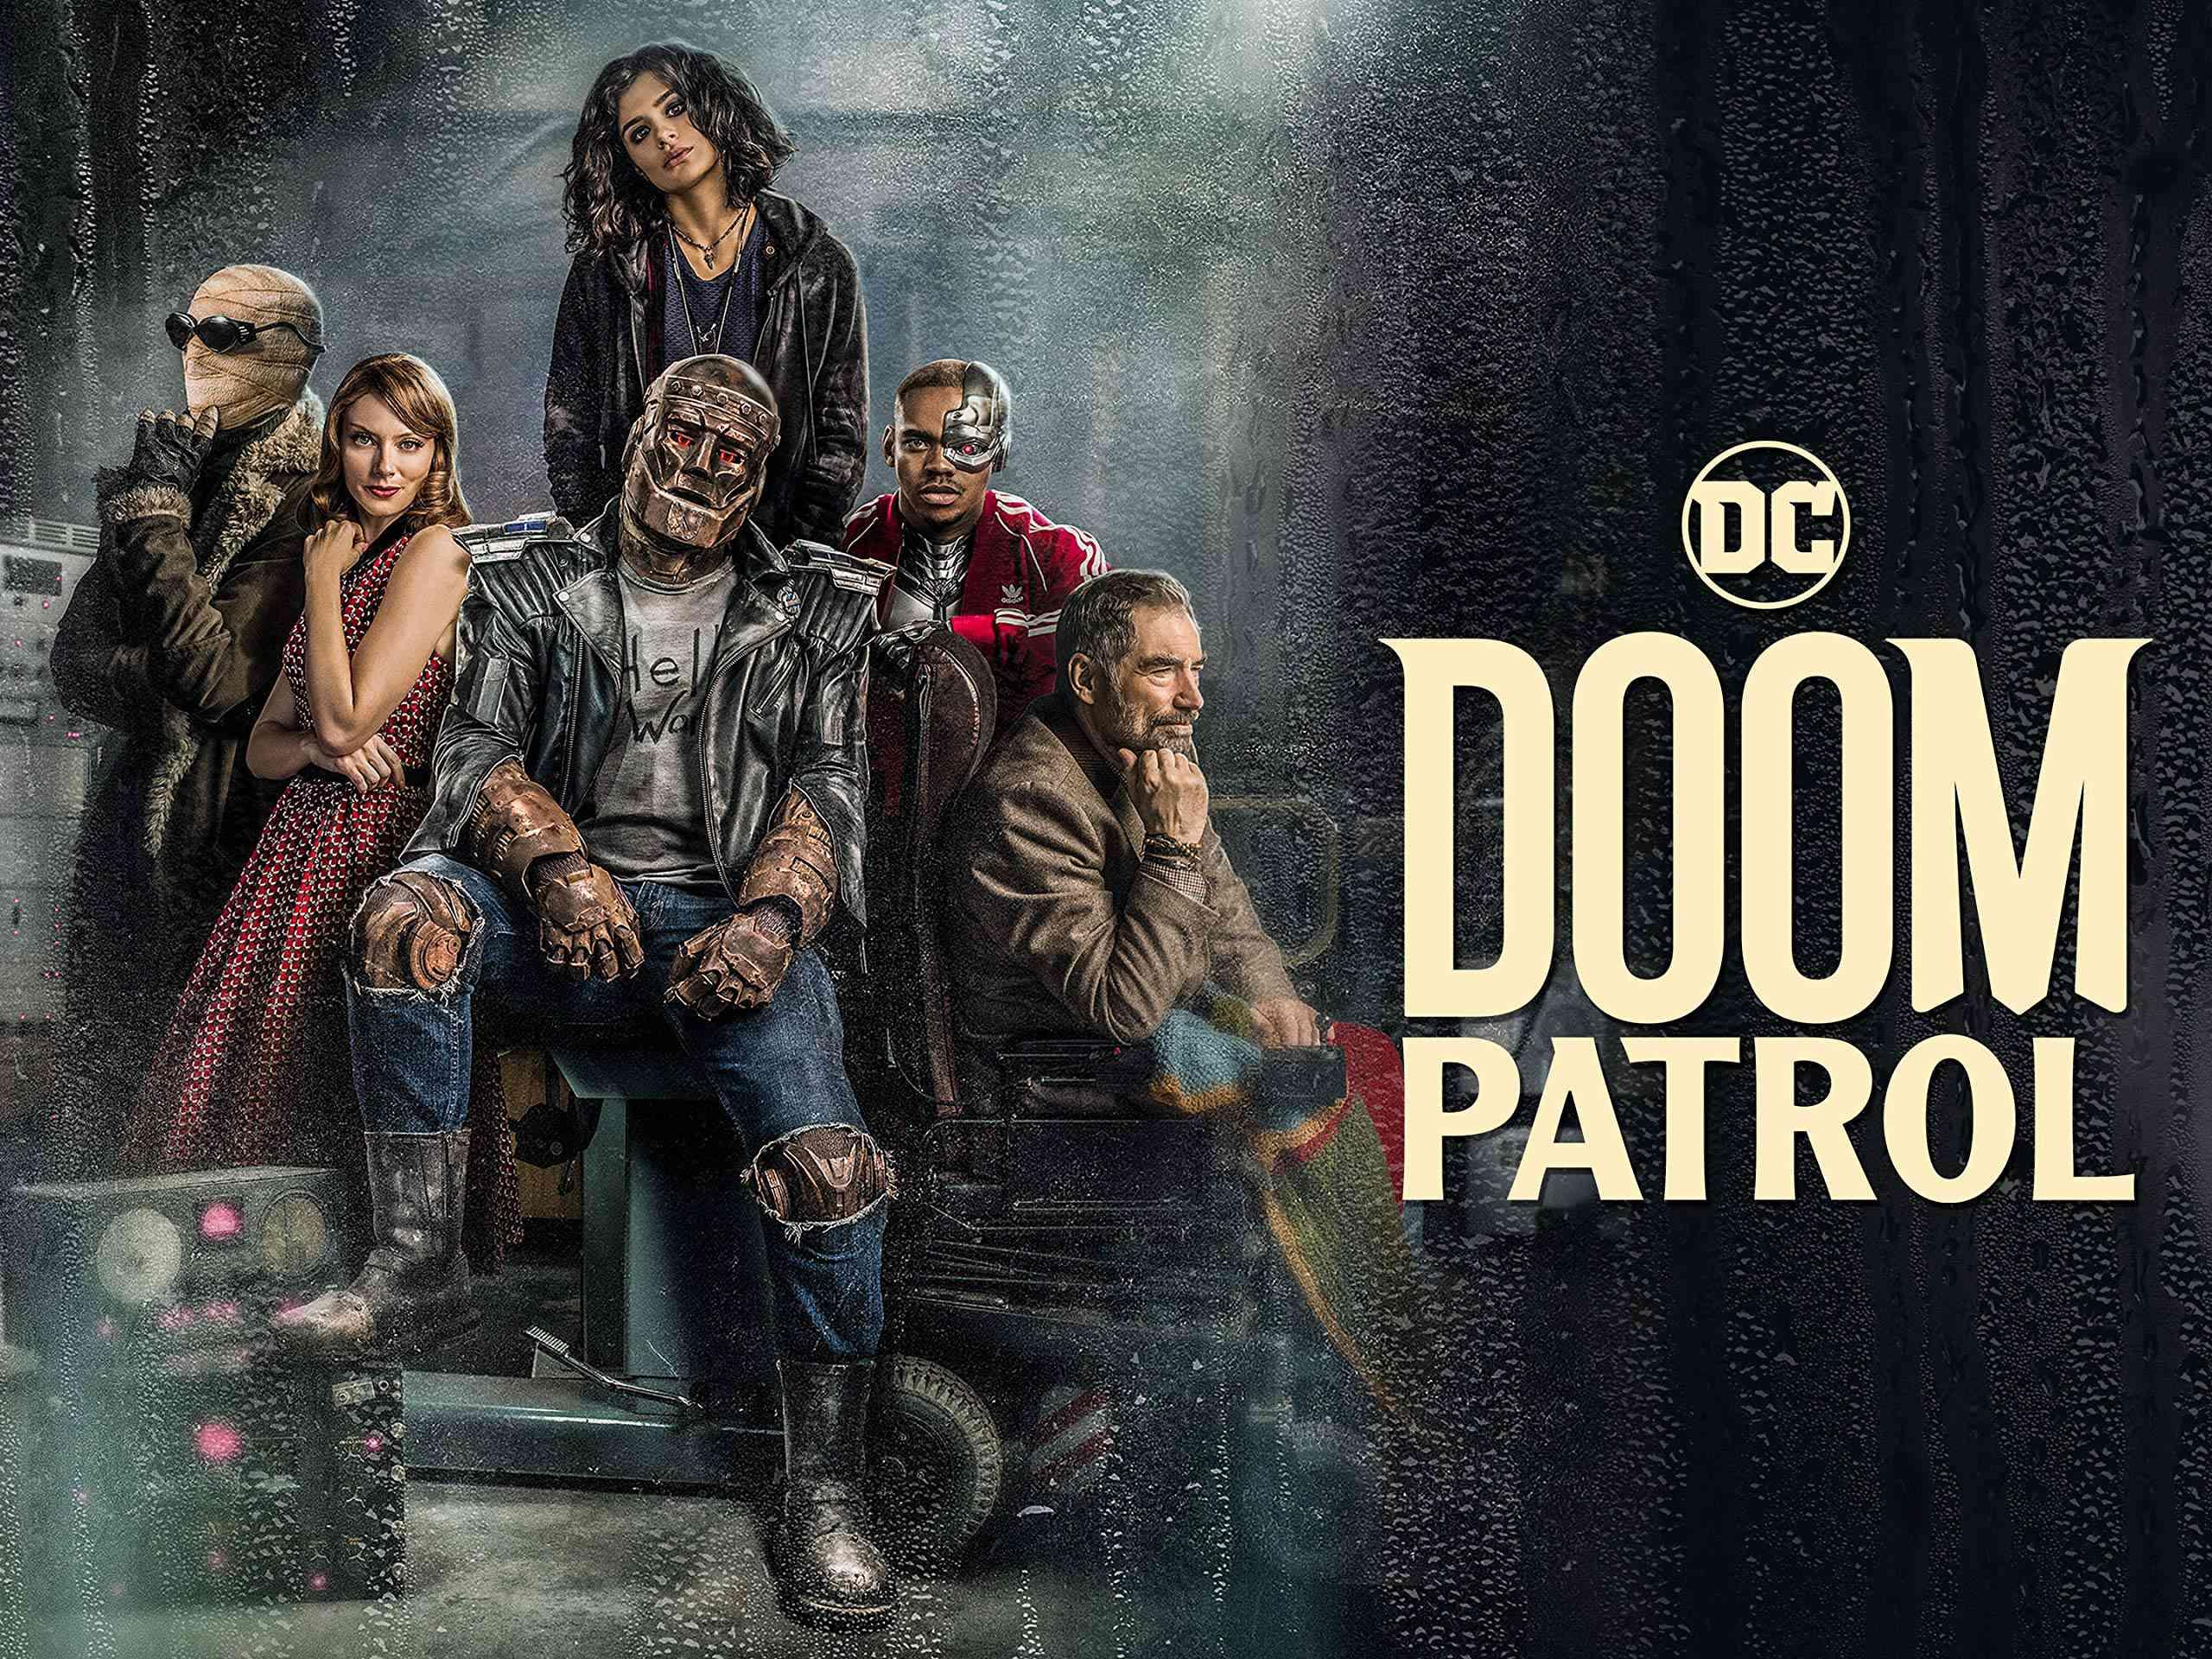 The cast of Doom Patrol